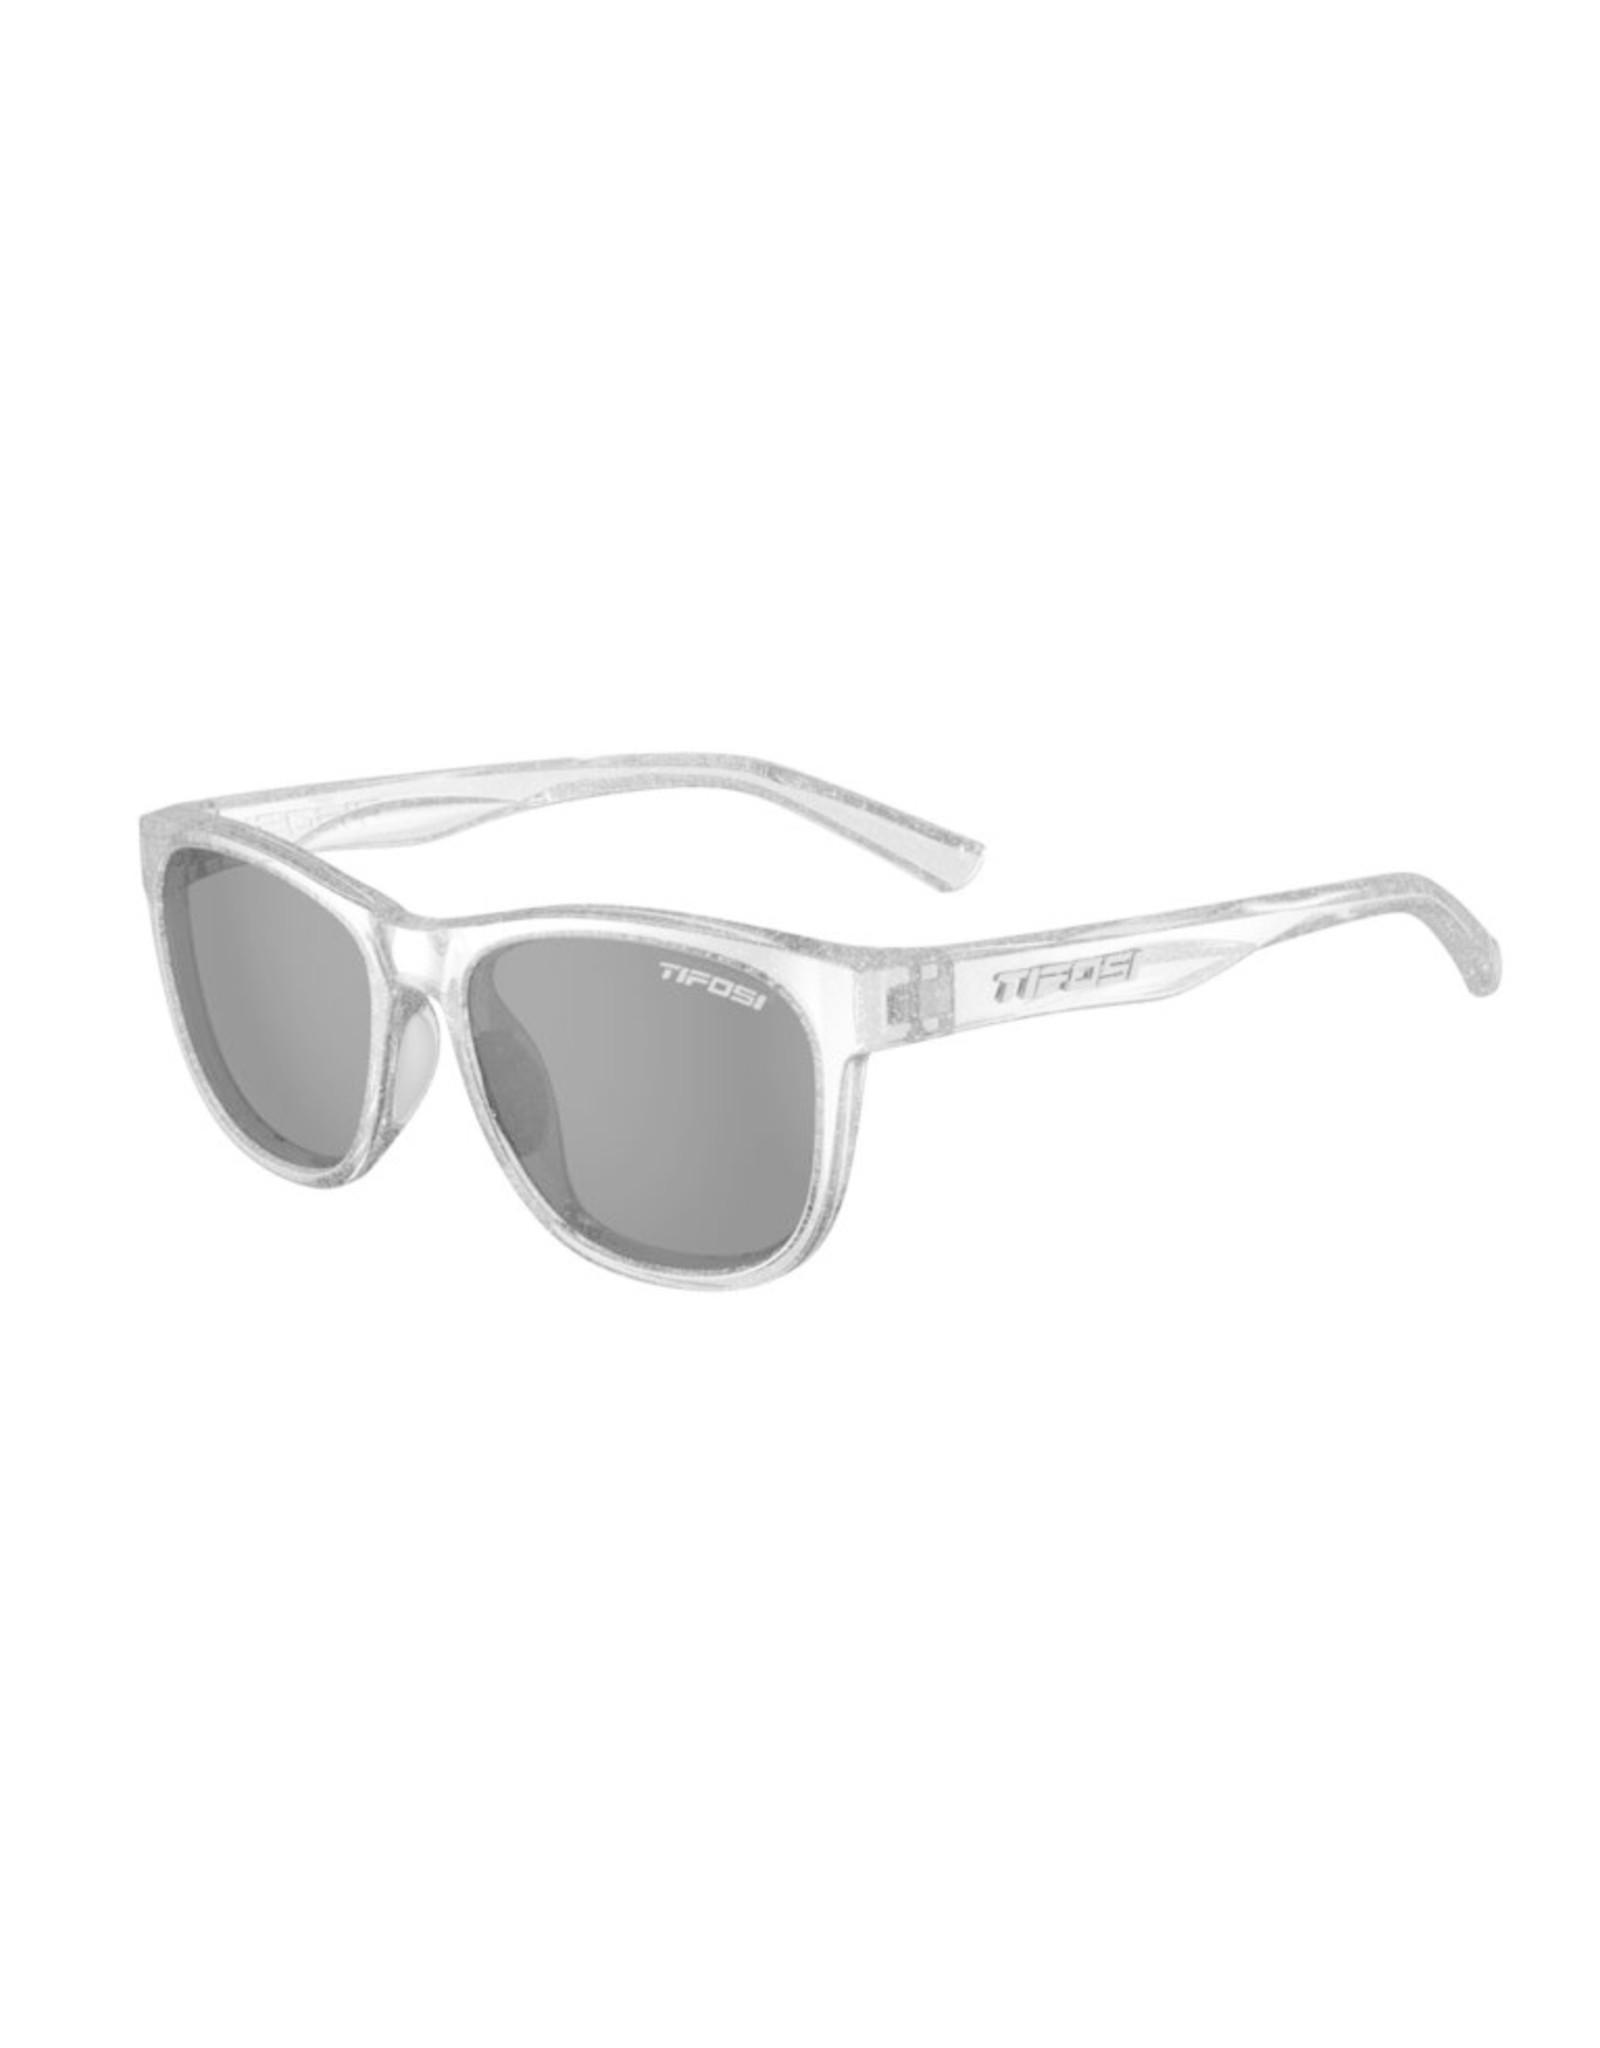 Tifosi Optics Smoke, Swank Glitter, Silver Shimmer Single Lens Sunglasses. Type: Single Lens